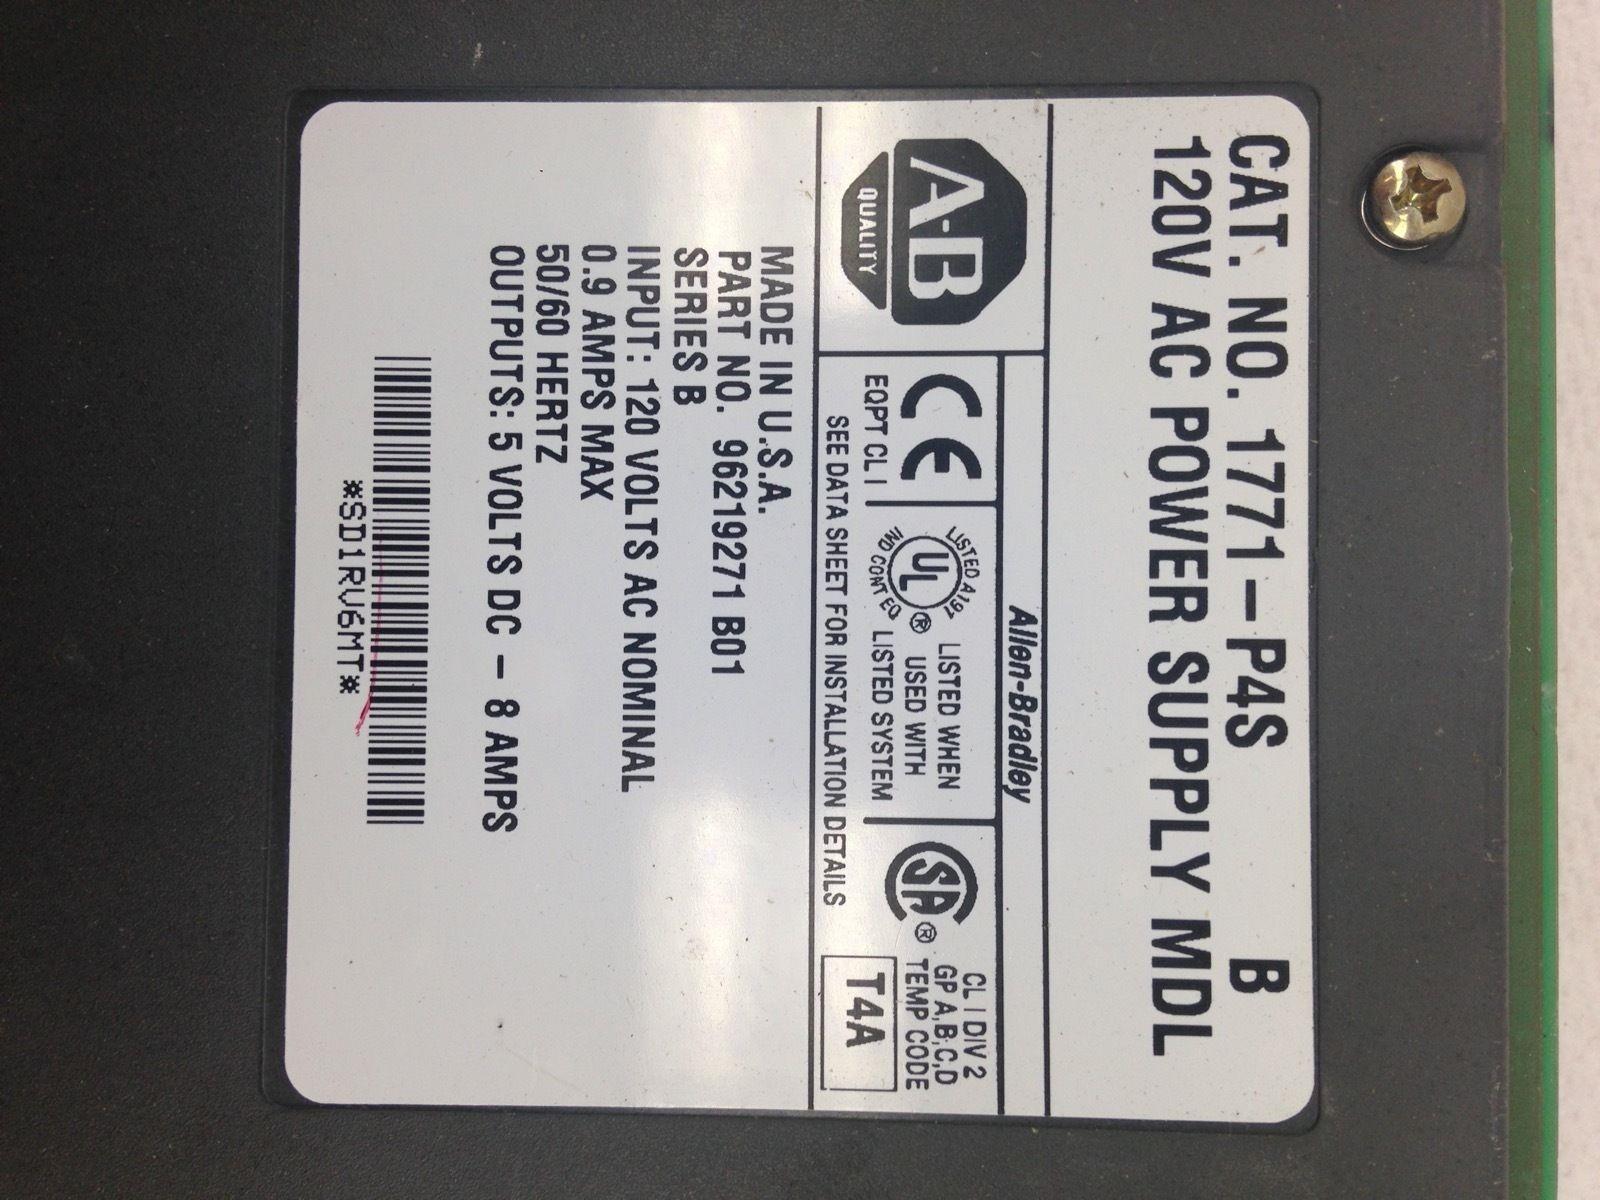 ALLEN BRADLEY 1771-P4S 120V AC POWER SUPPLY MODEL B NEW (B55) 2